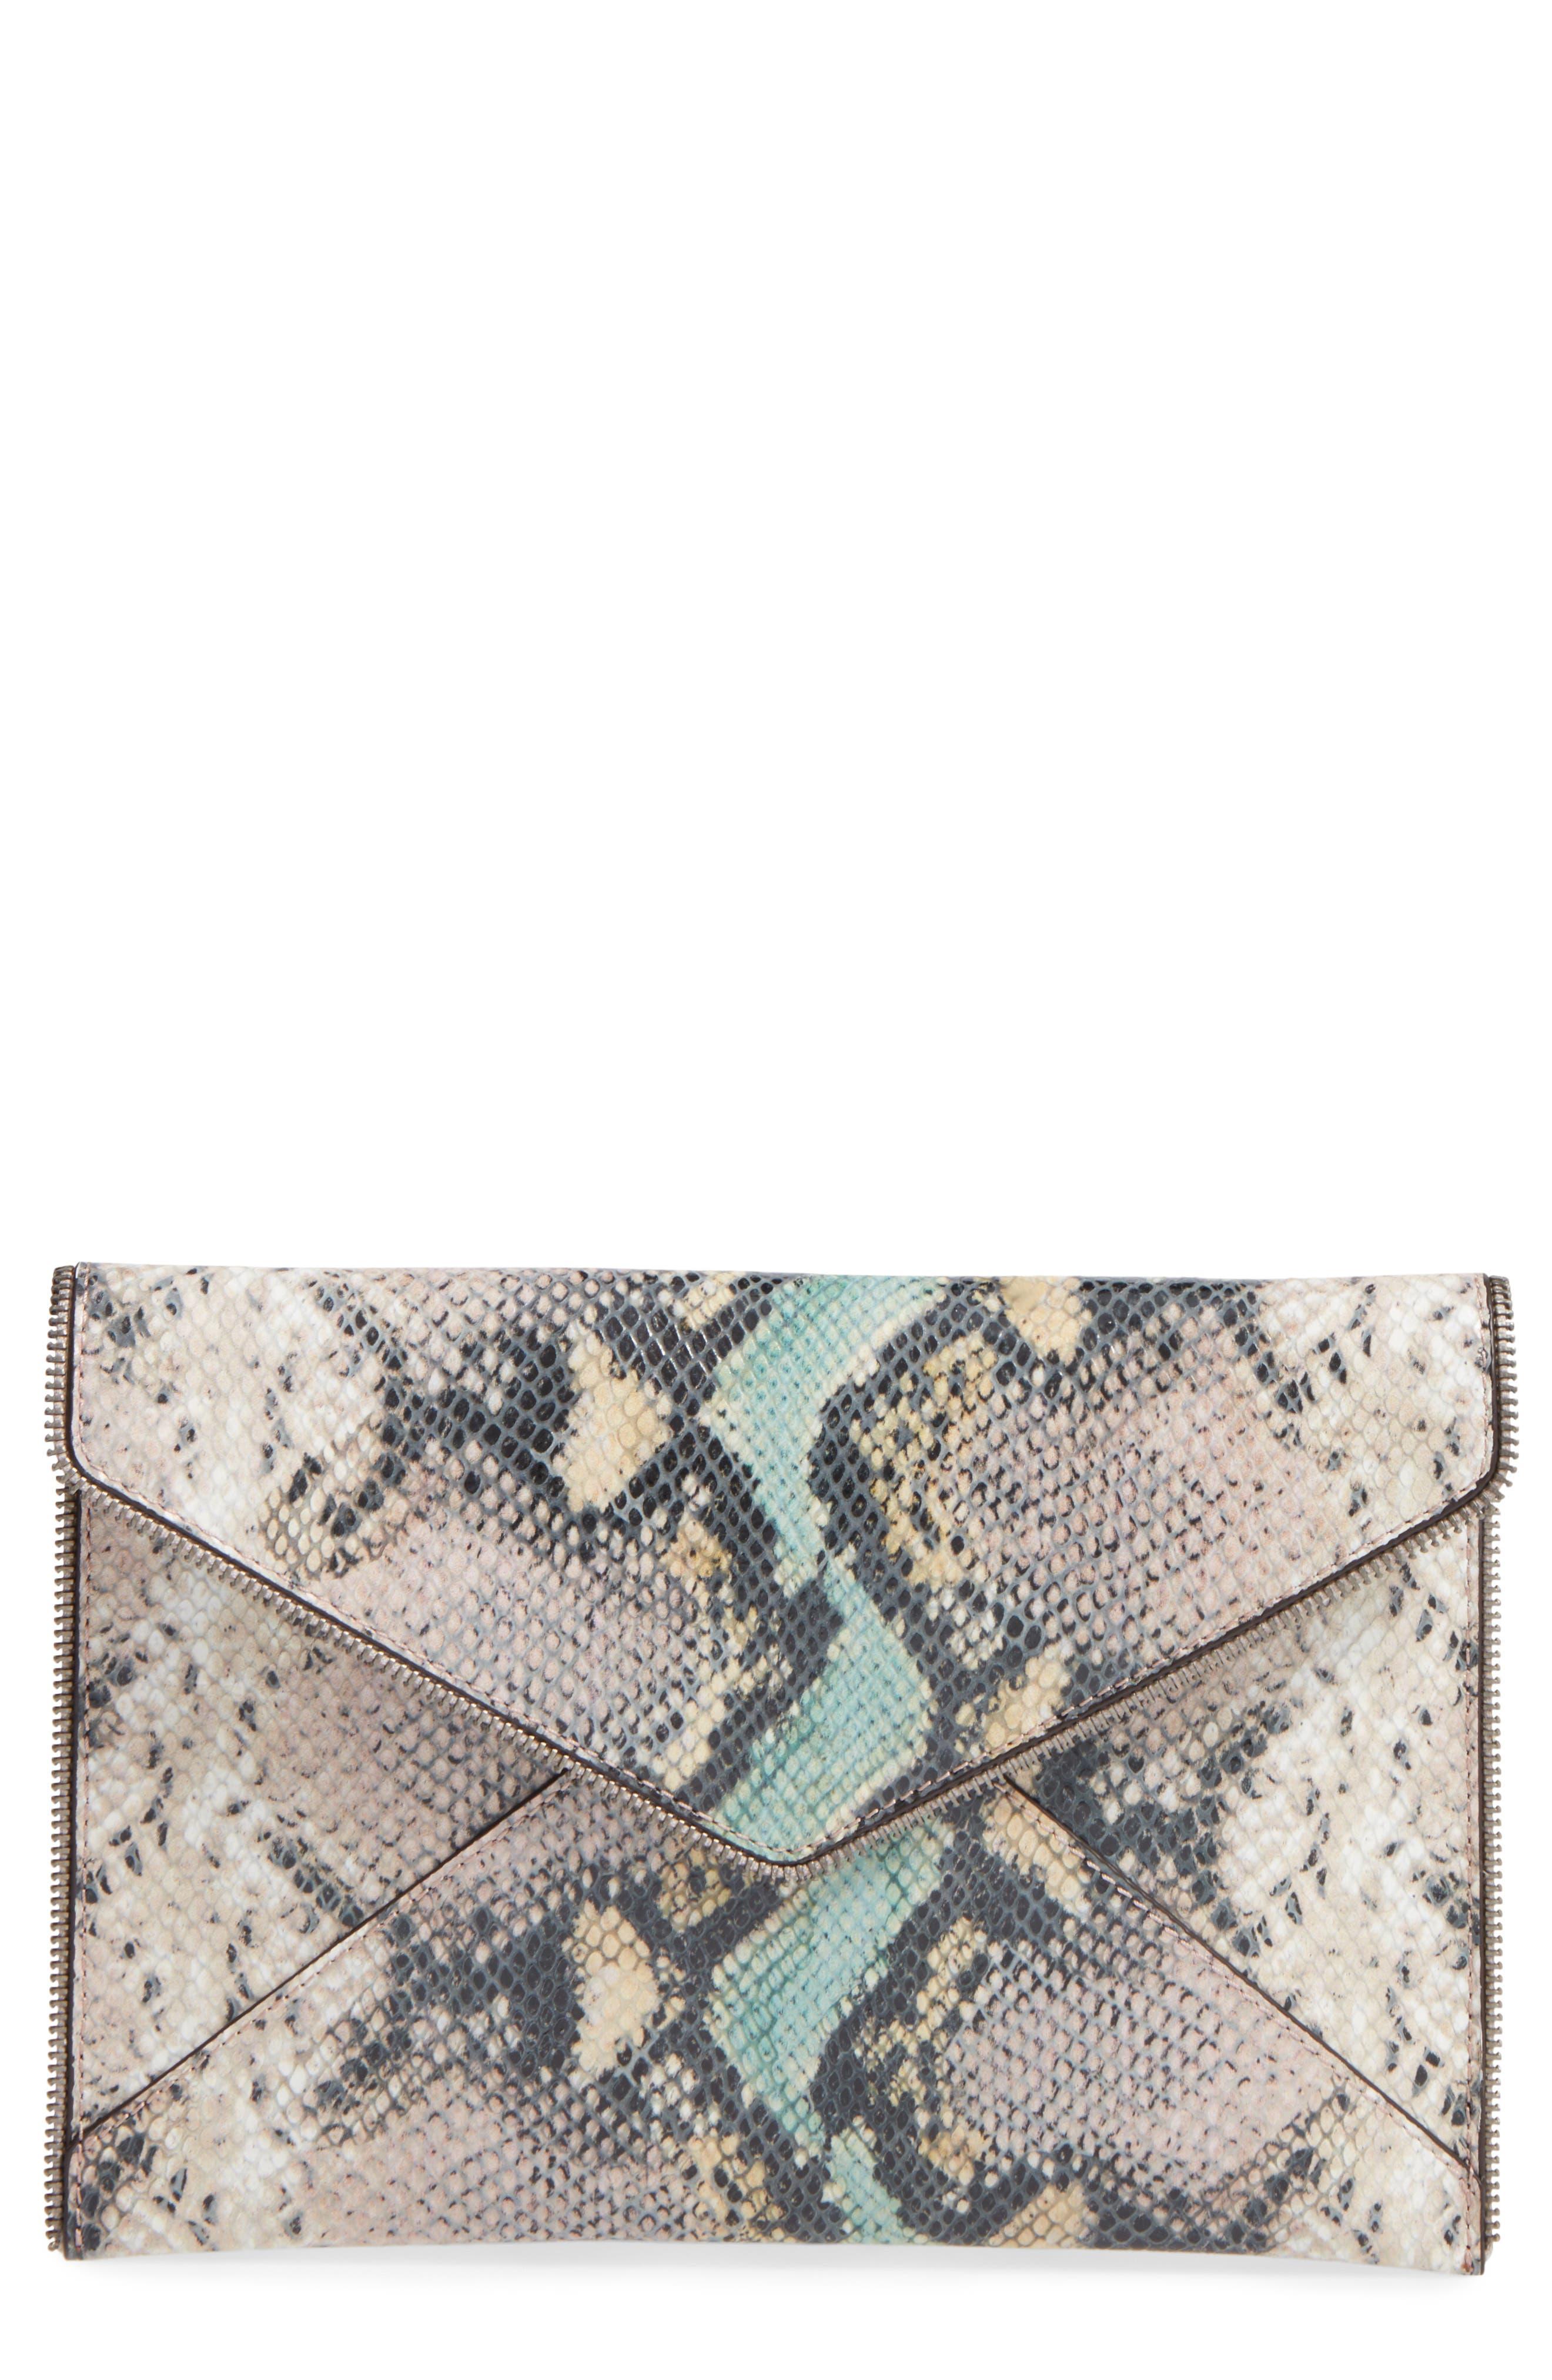 Main Image - Rebecca Minkoff Leo Snake Embossed Leather Clutch